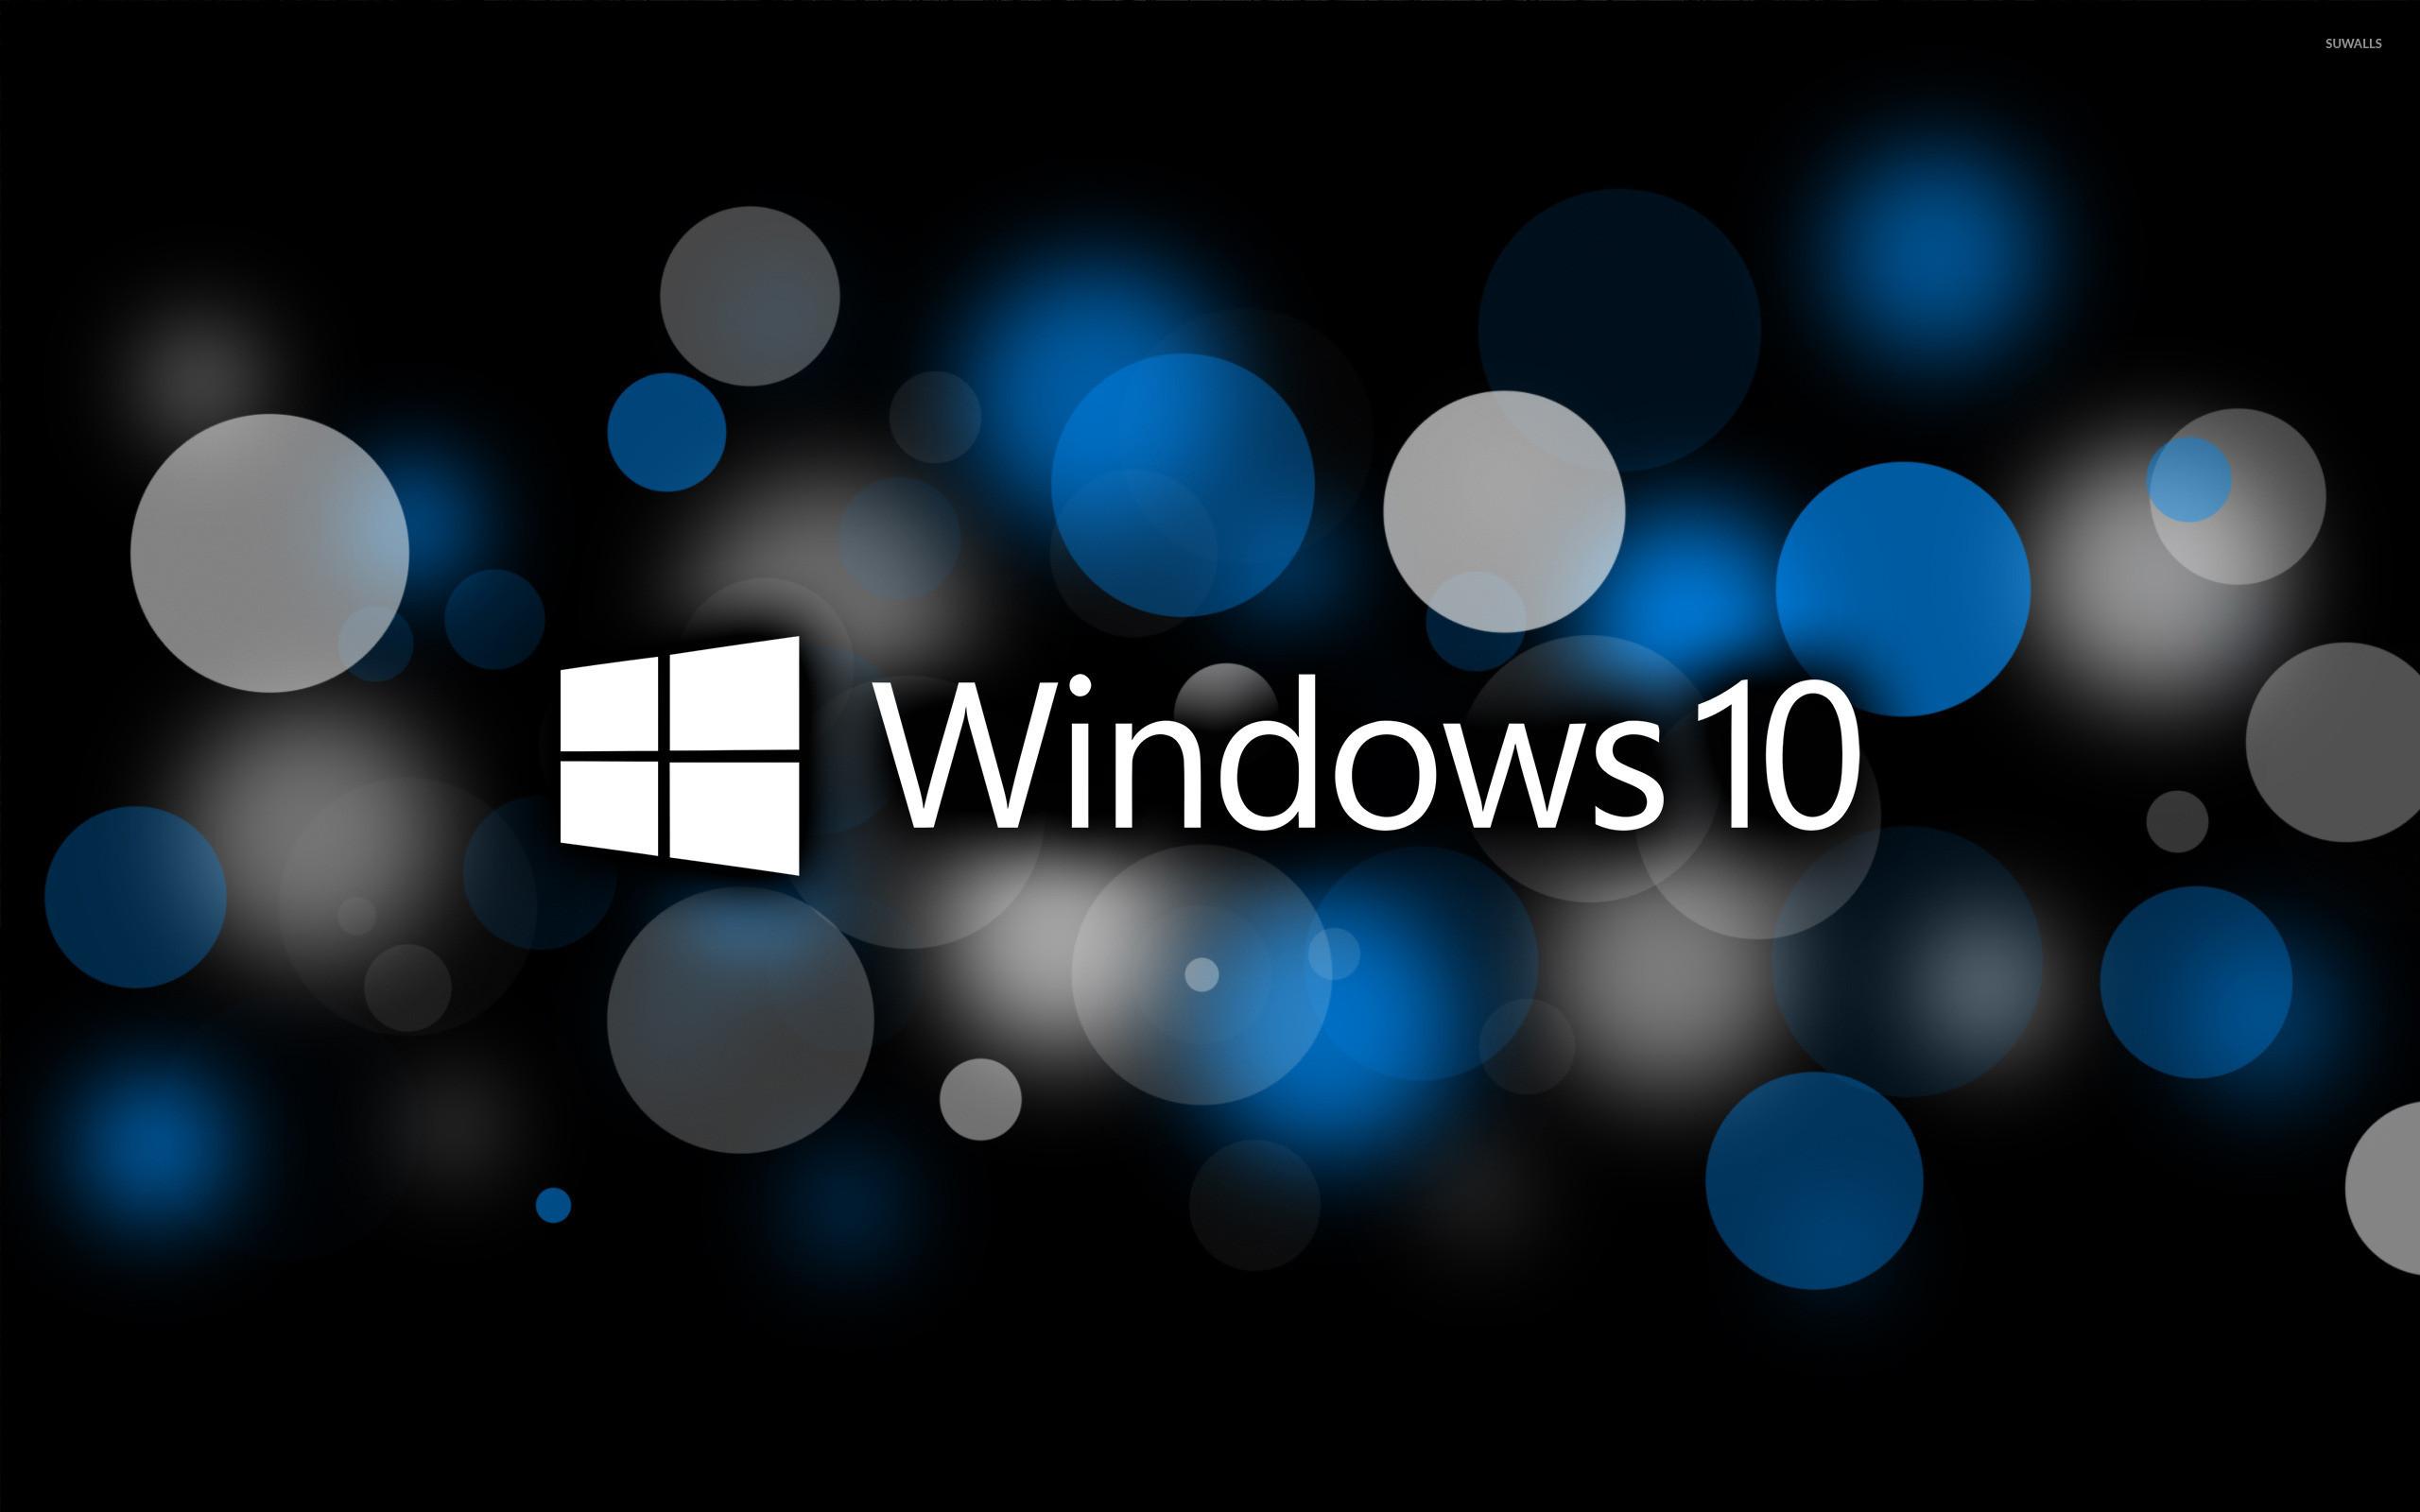 Dell Wallpaper Windows 10 72 Images: Black Windows 10 Wallpaper (65+ Images